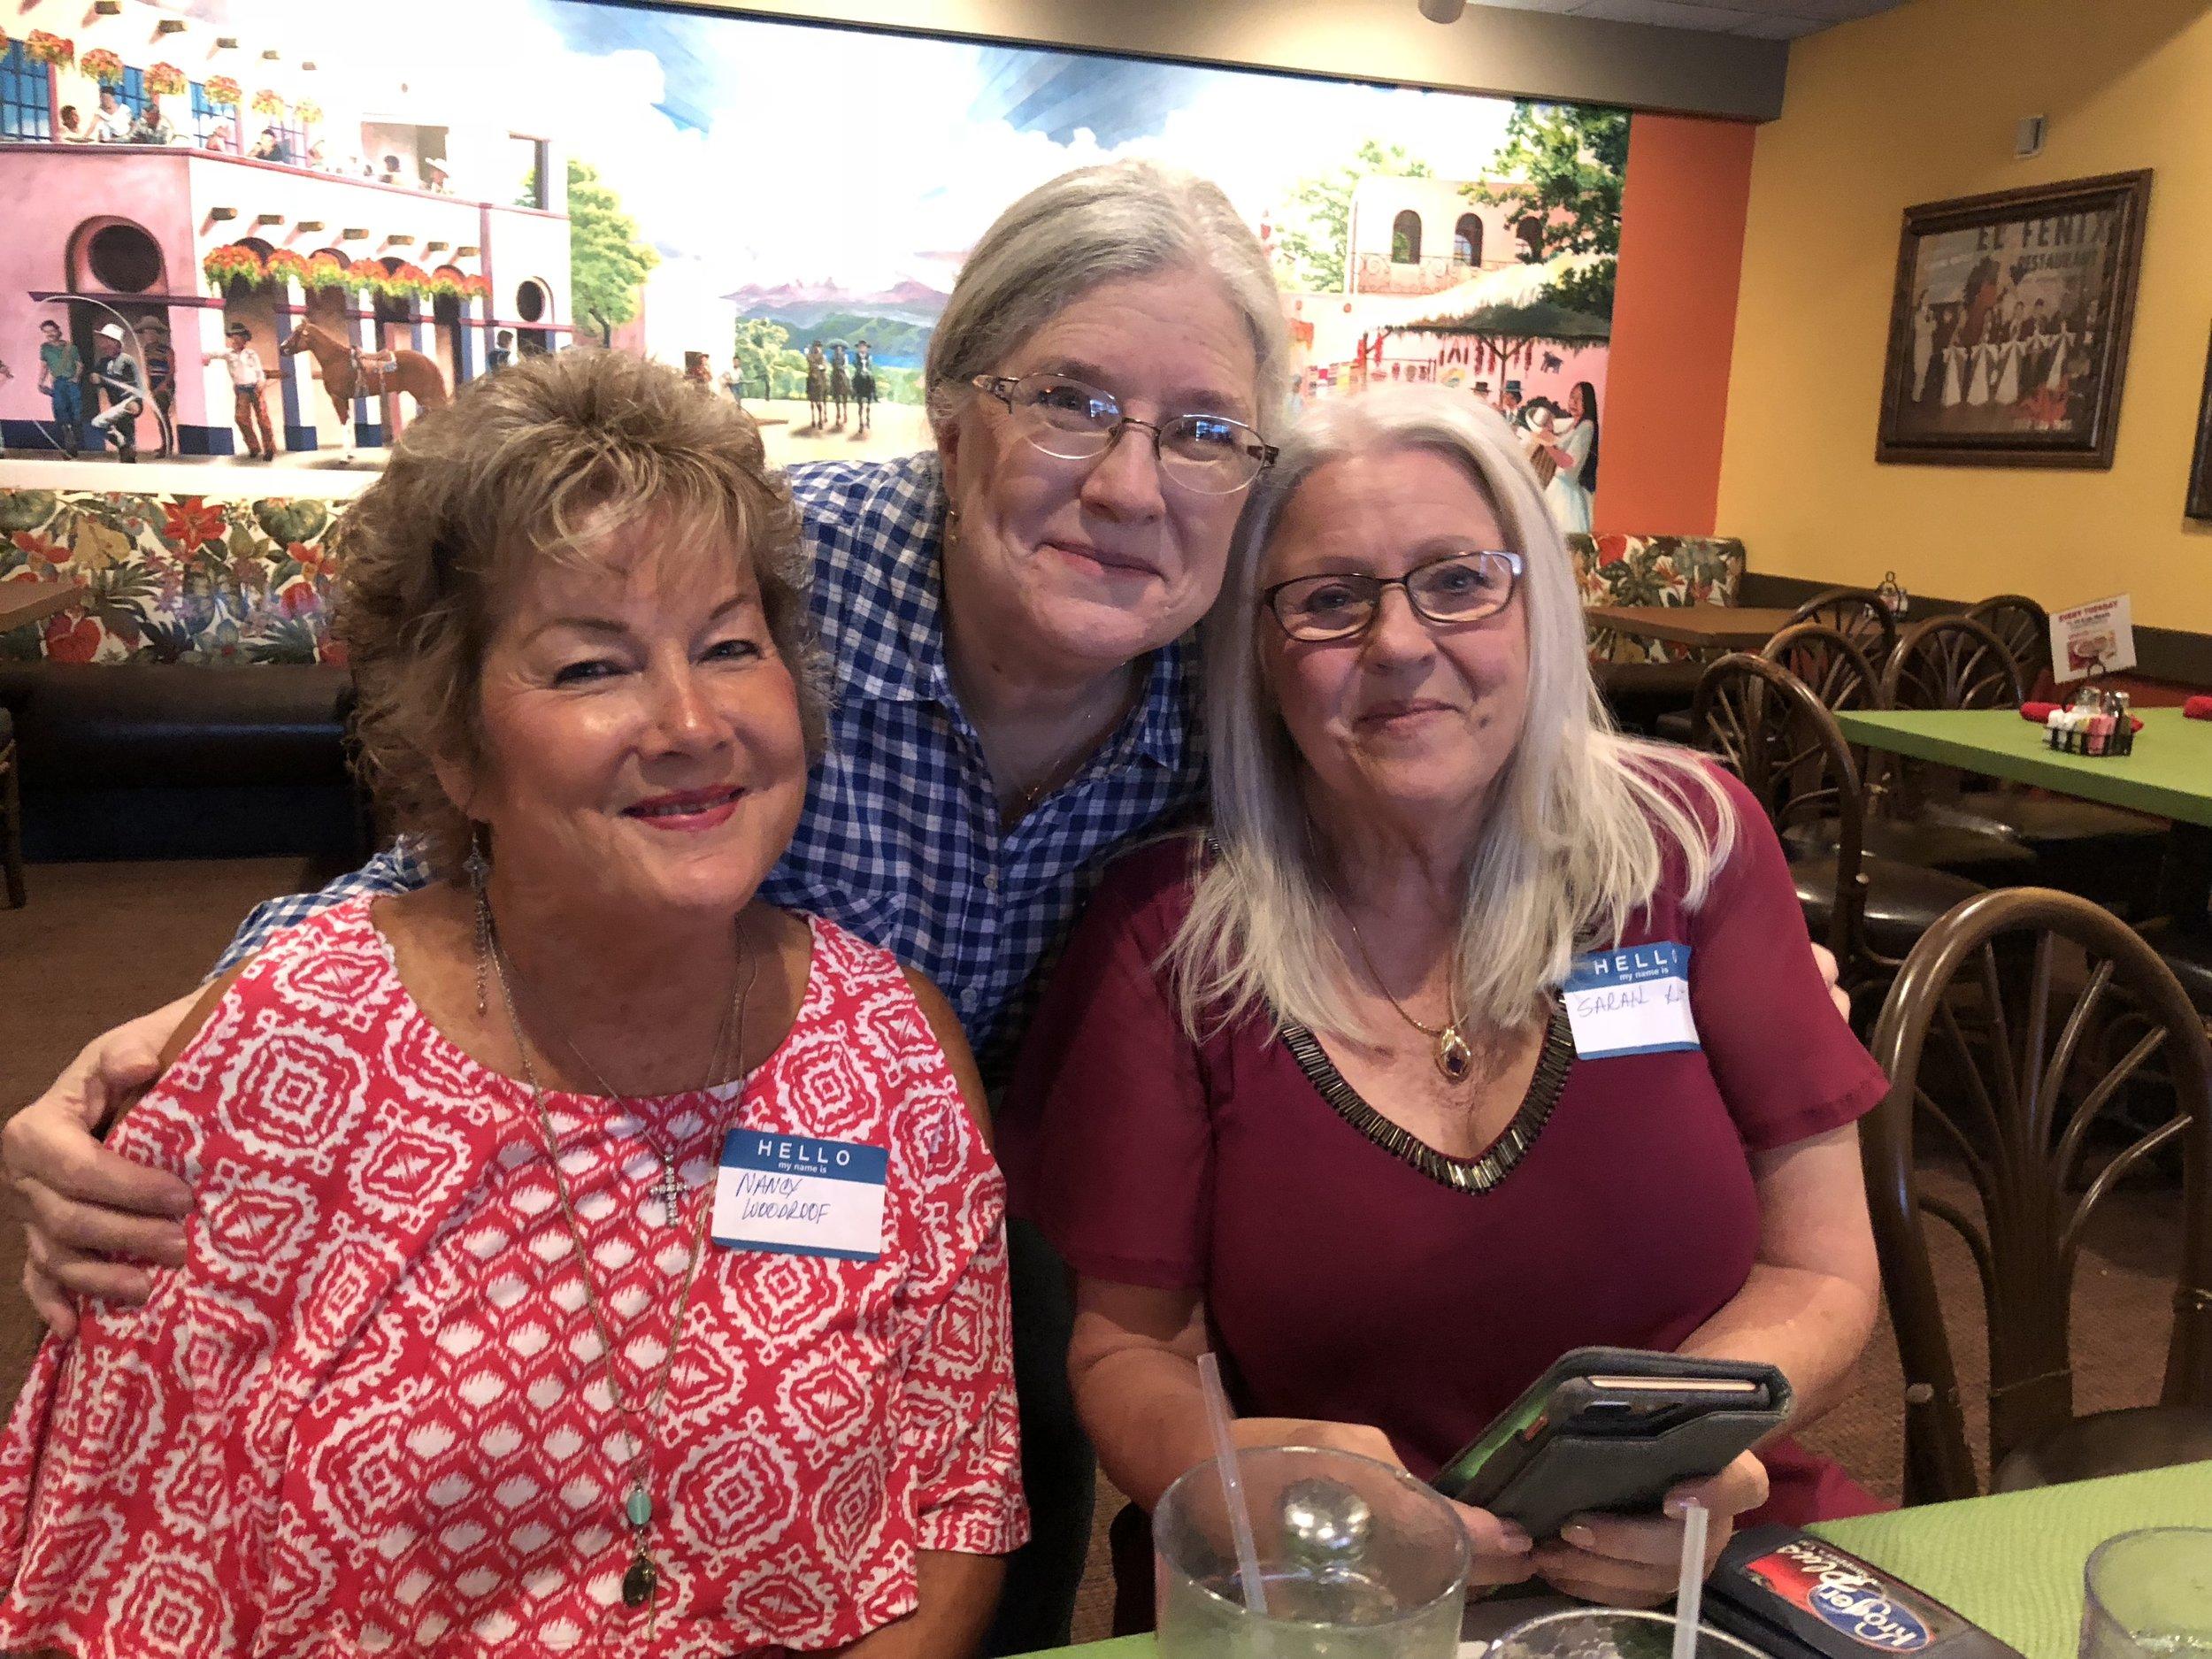 Nancy Woodruff Pate, Debbie Pace Marsden and Sarah Hott Grace